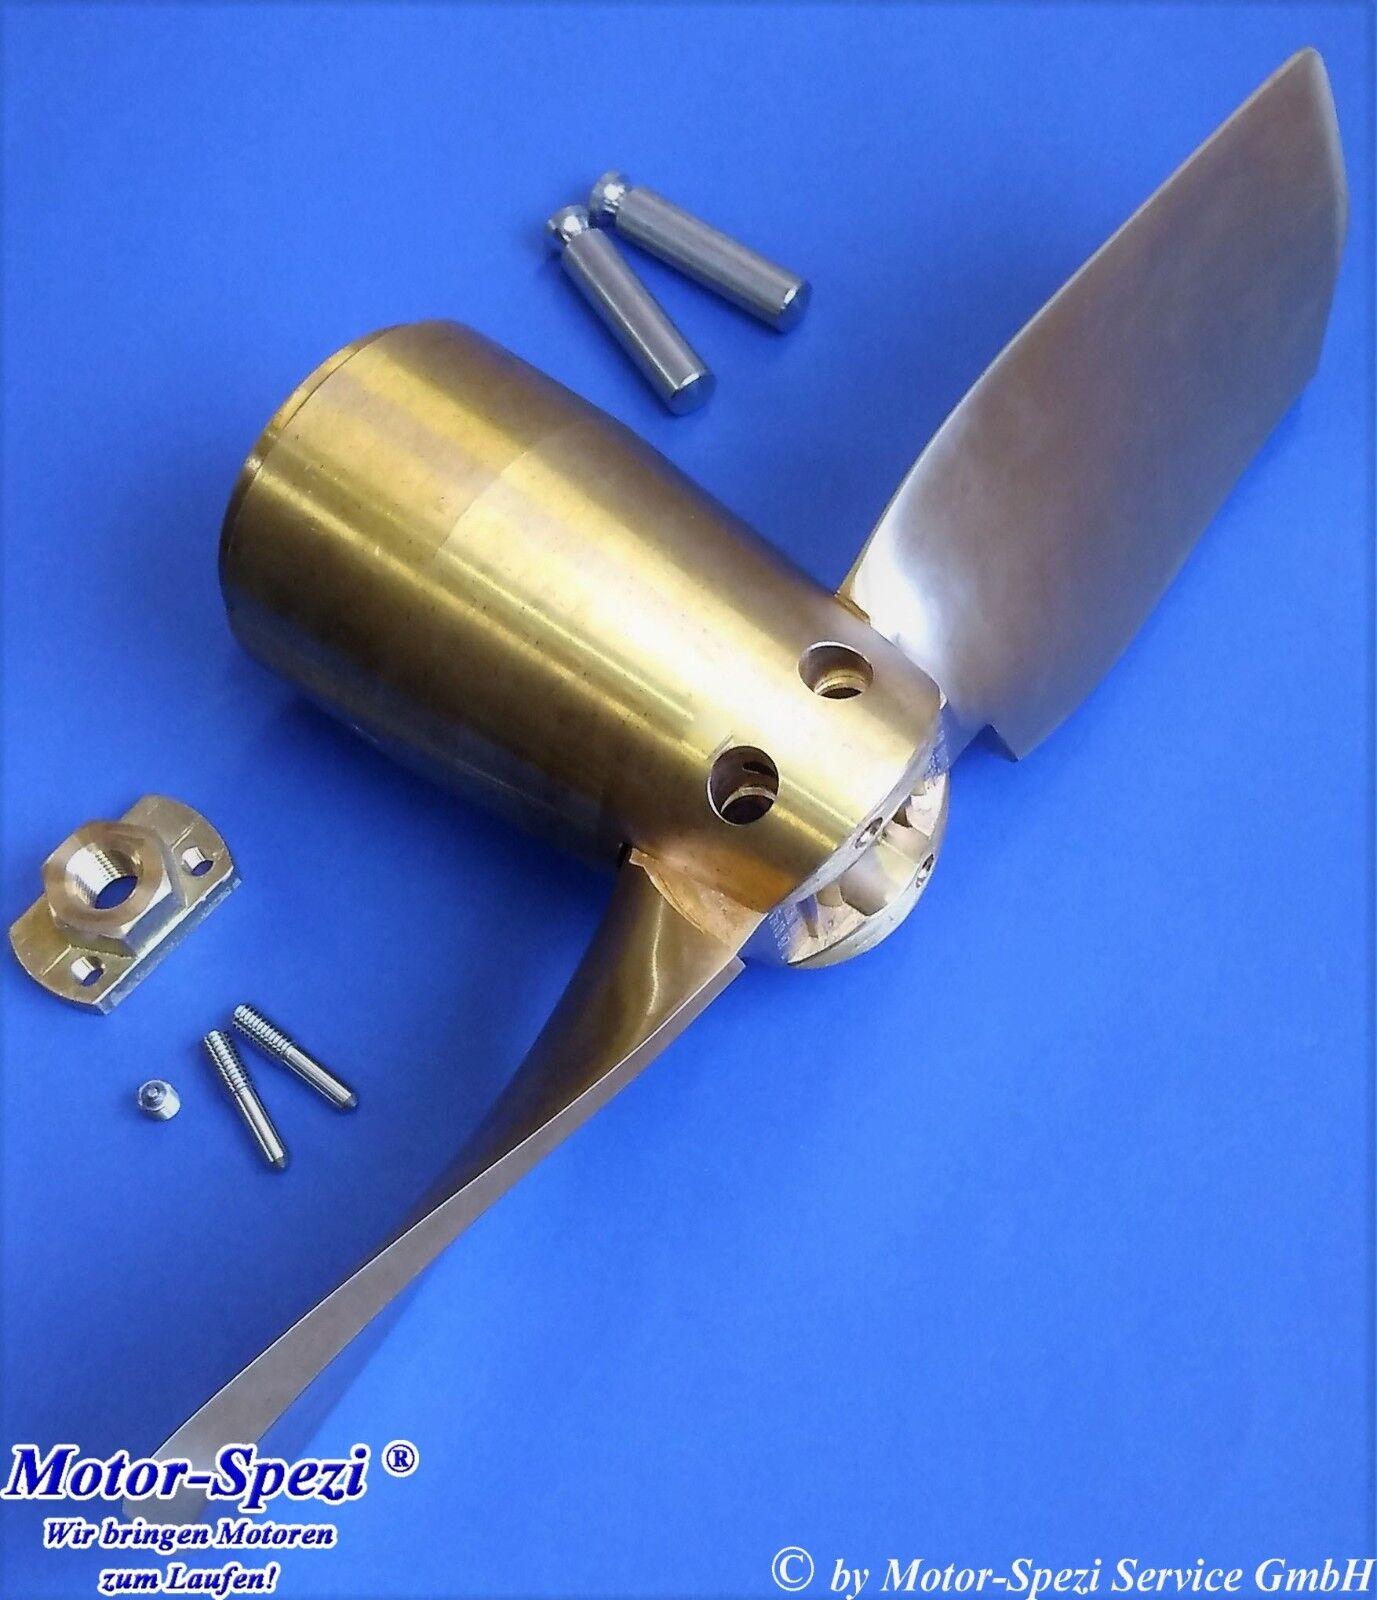 Faltpropeller aus Bronze, 16 x 11 für Saildrive Yanmar, Zweiblatt Propeller